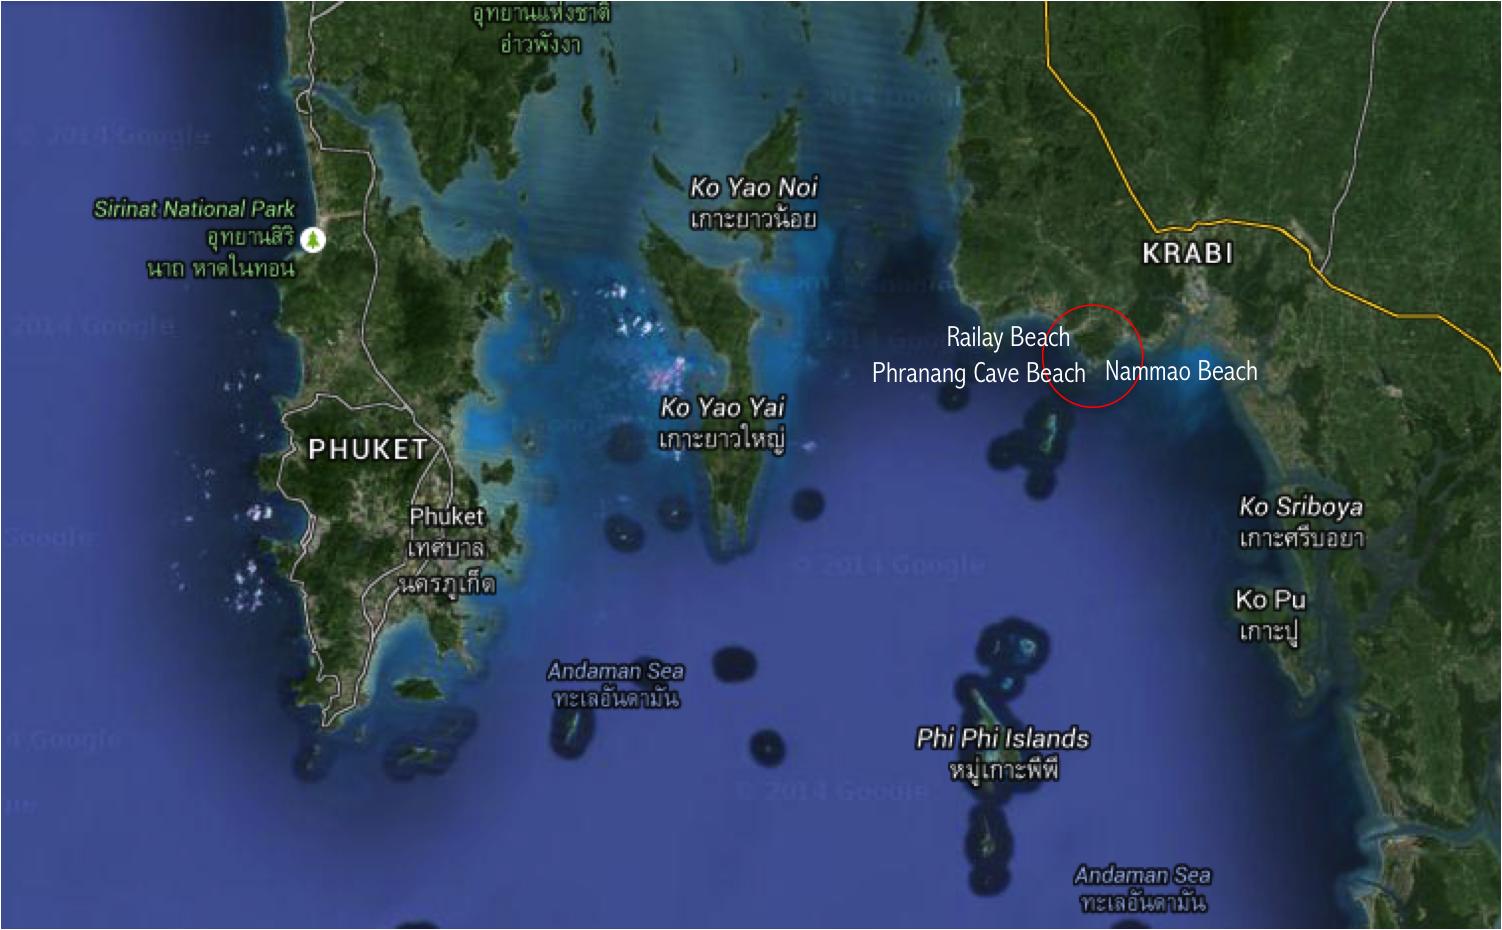 onde fica railay beach krabi tailandia